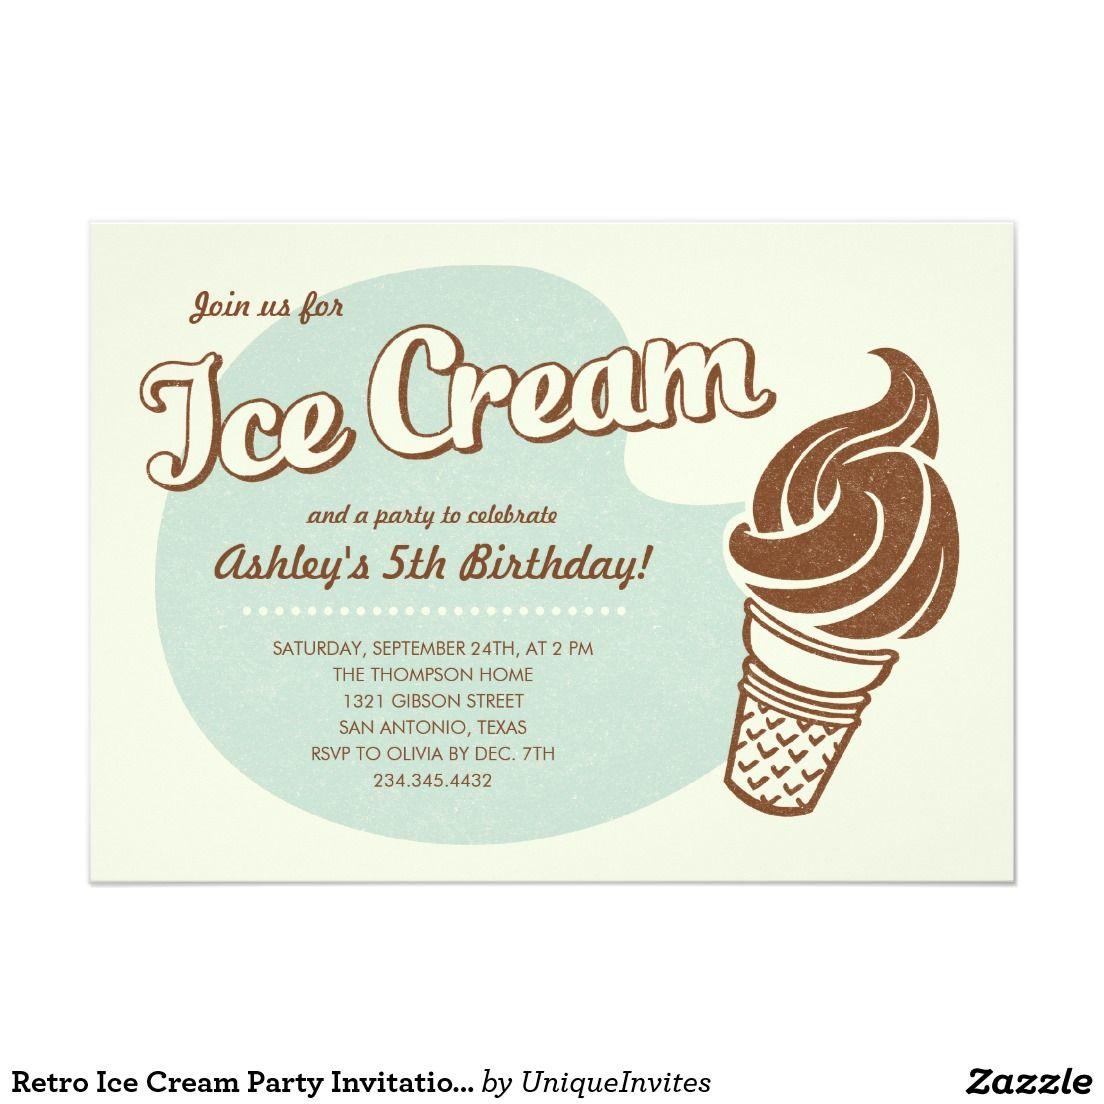 Retro Ice Cream Party Invitations 5\